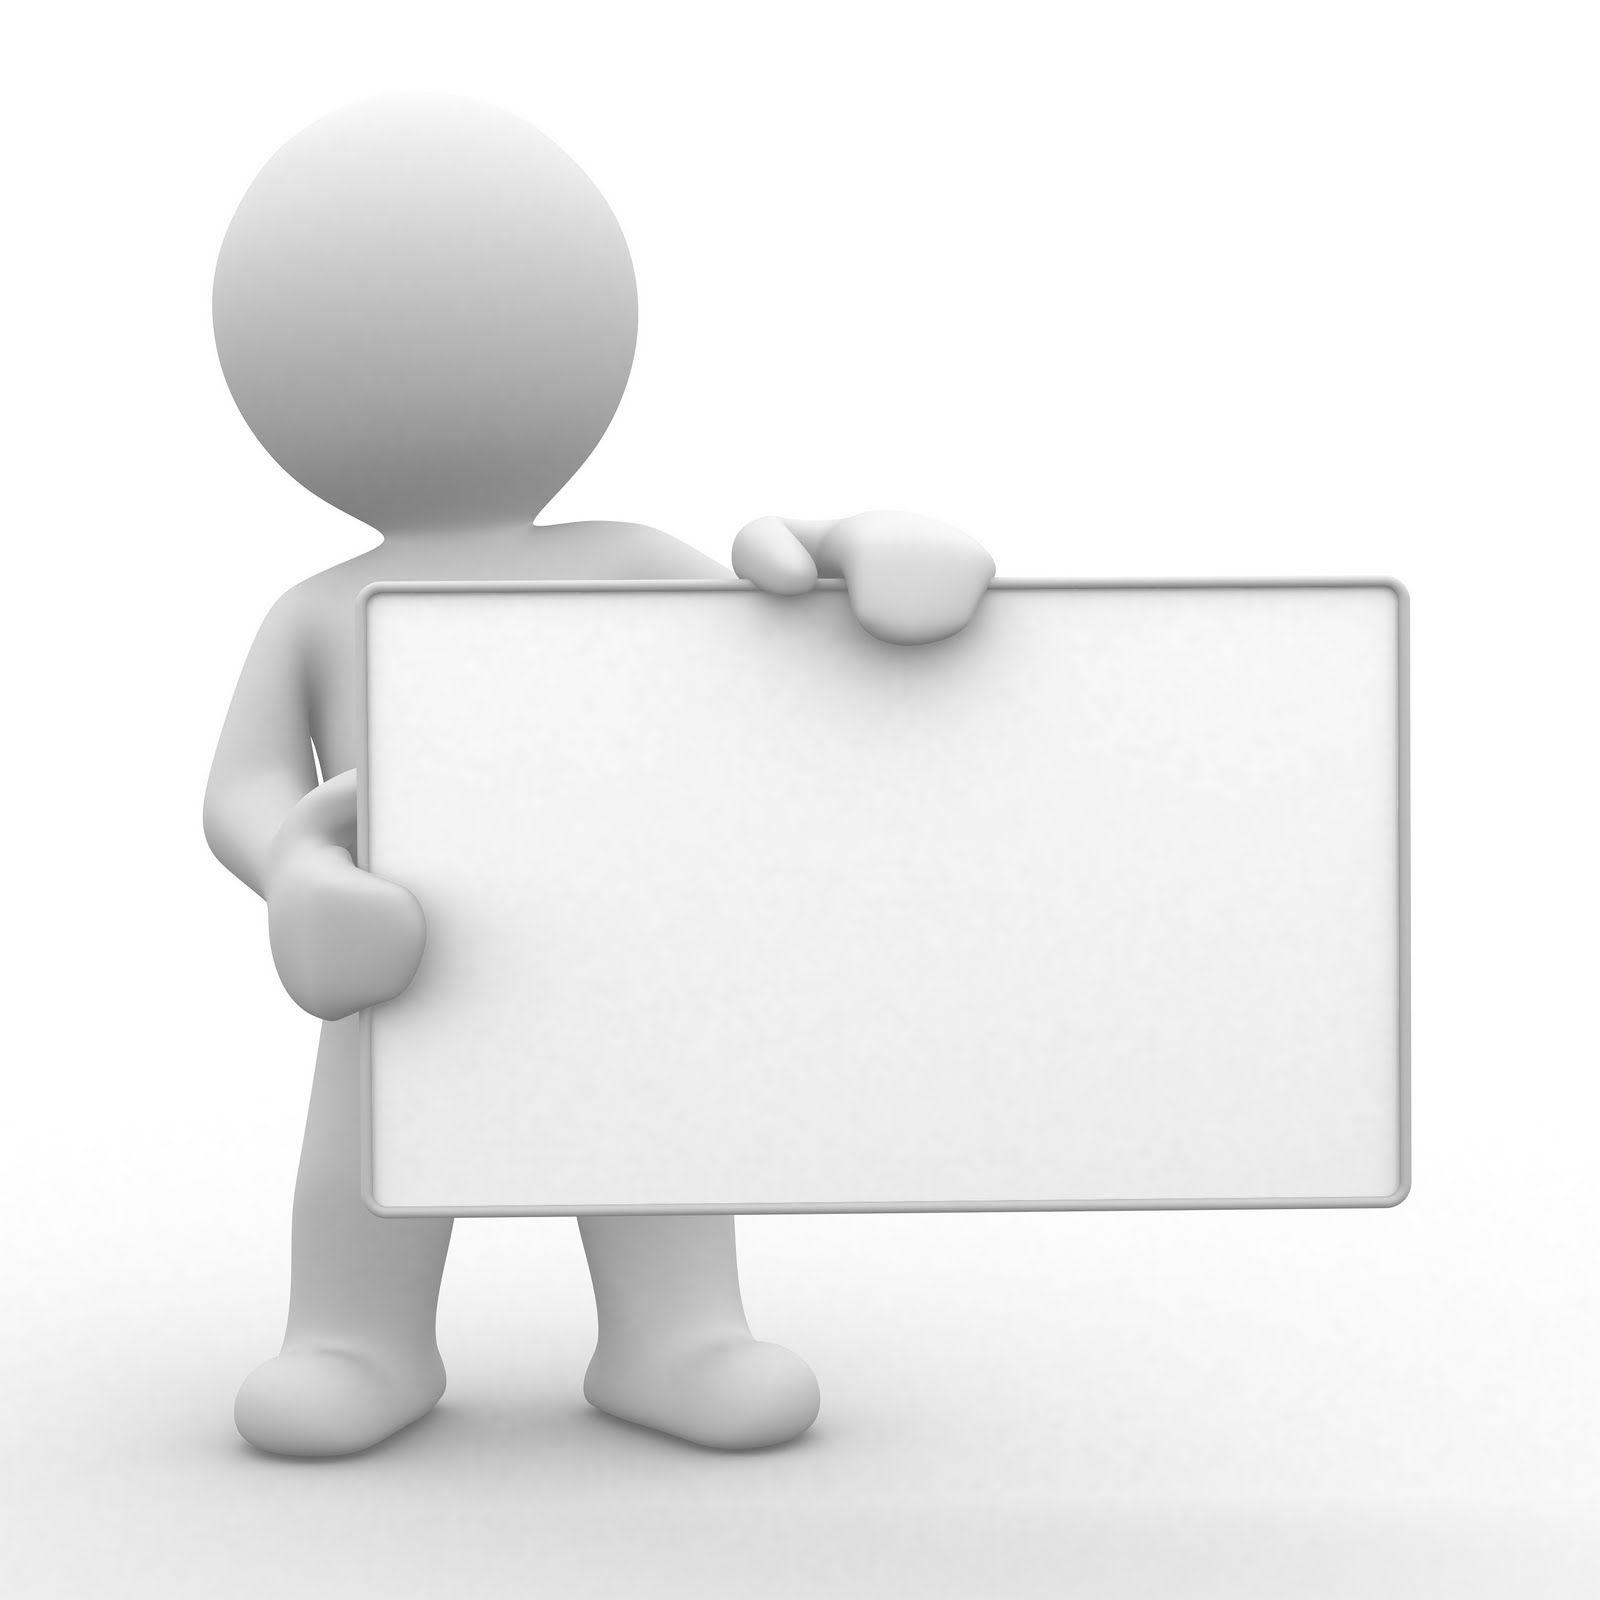 Http Karlareyna76 Blogspot Com 2013 06 Munecos Para Presentaciones